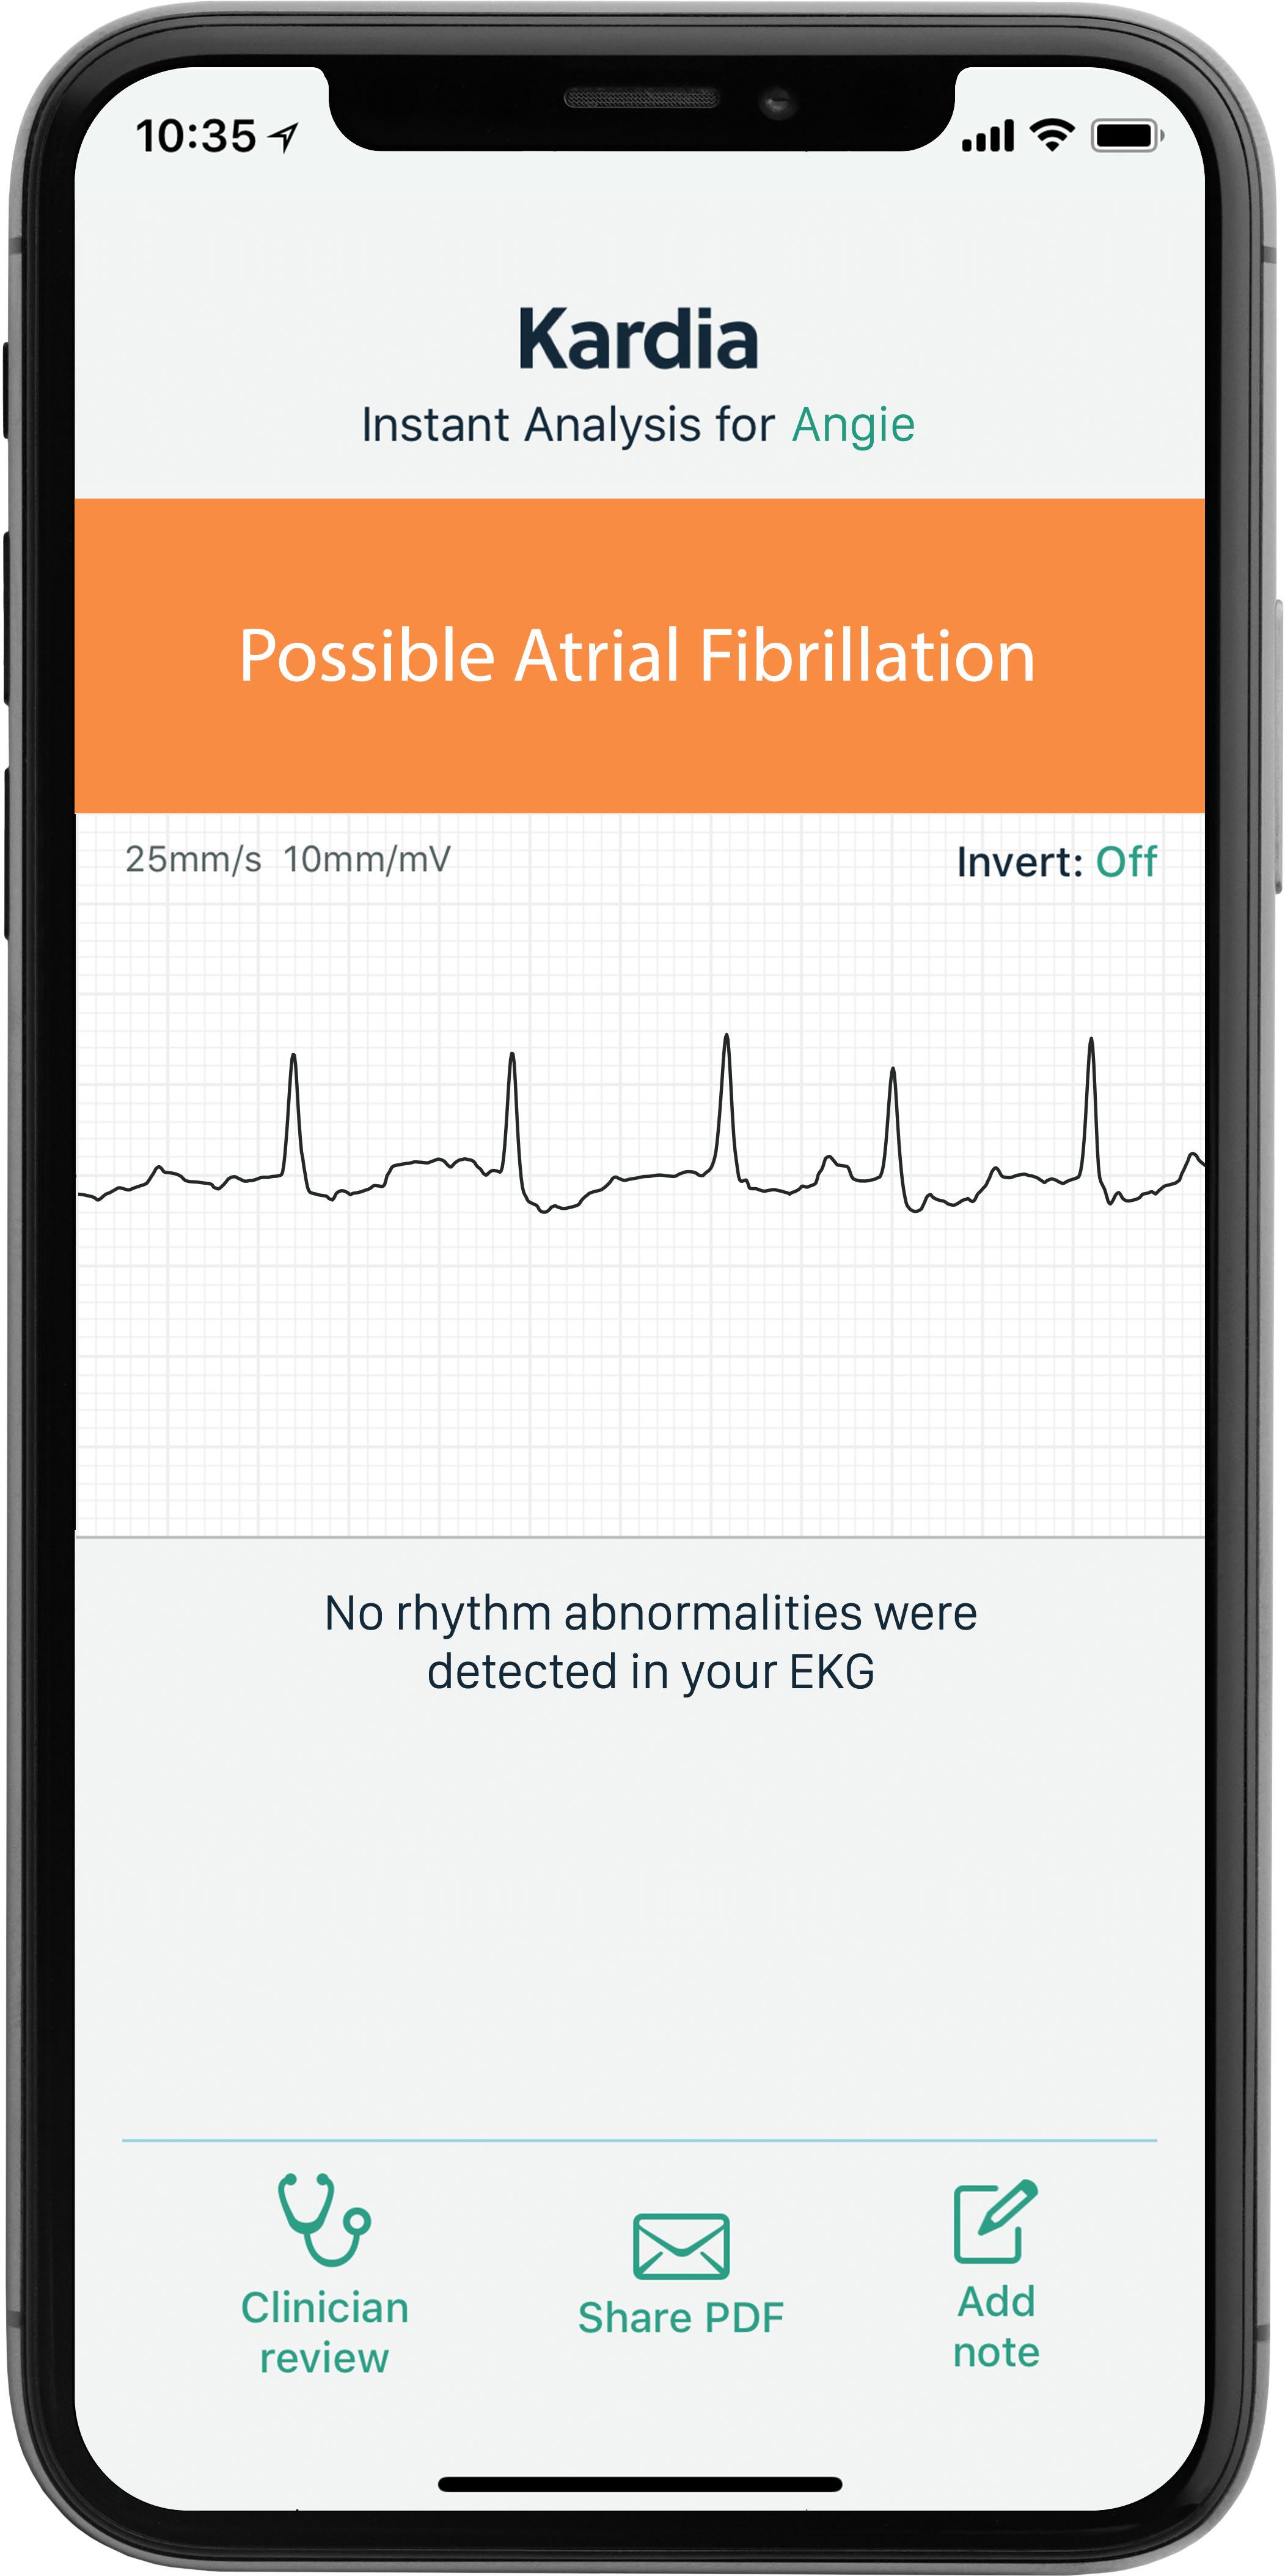 AliveCor KardiaMobile 6L Personal EKG device